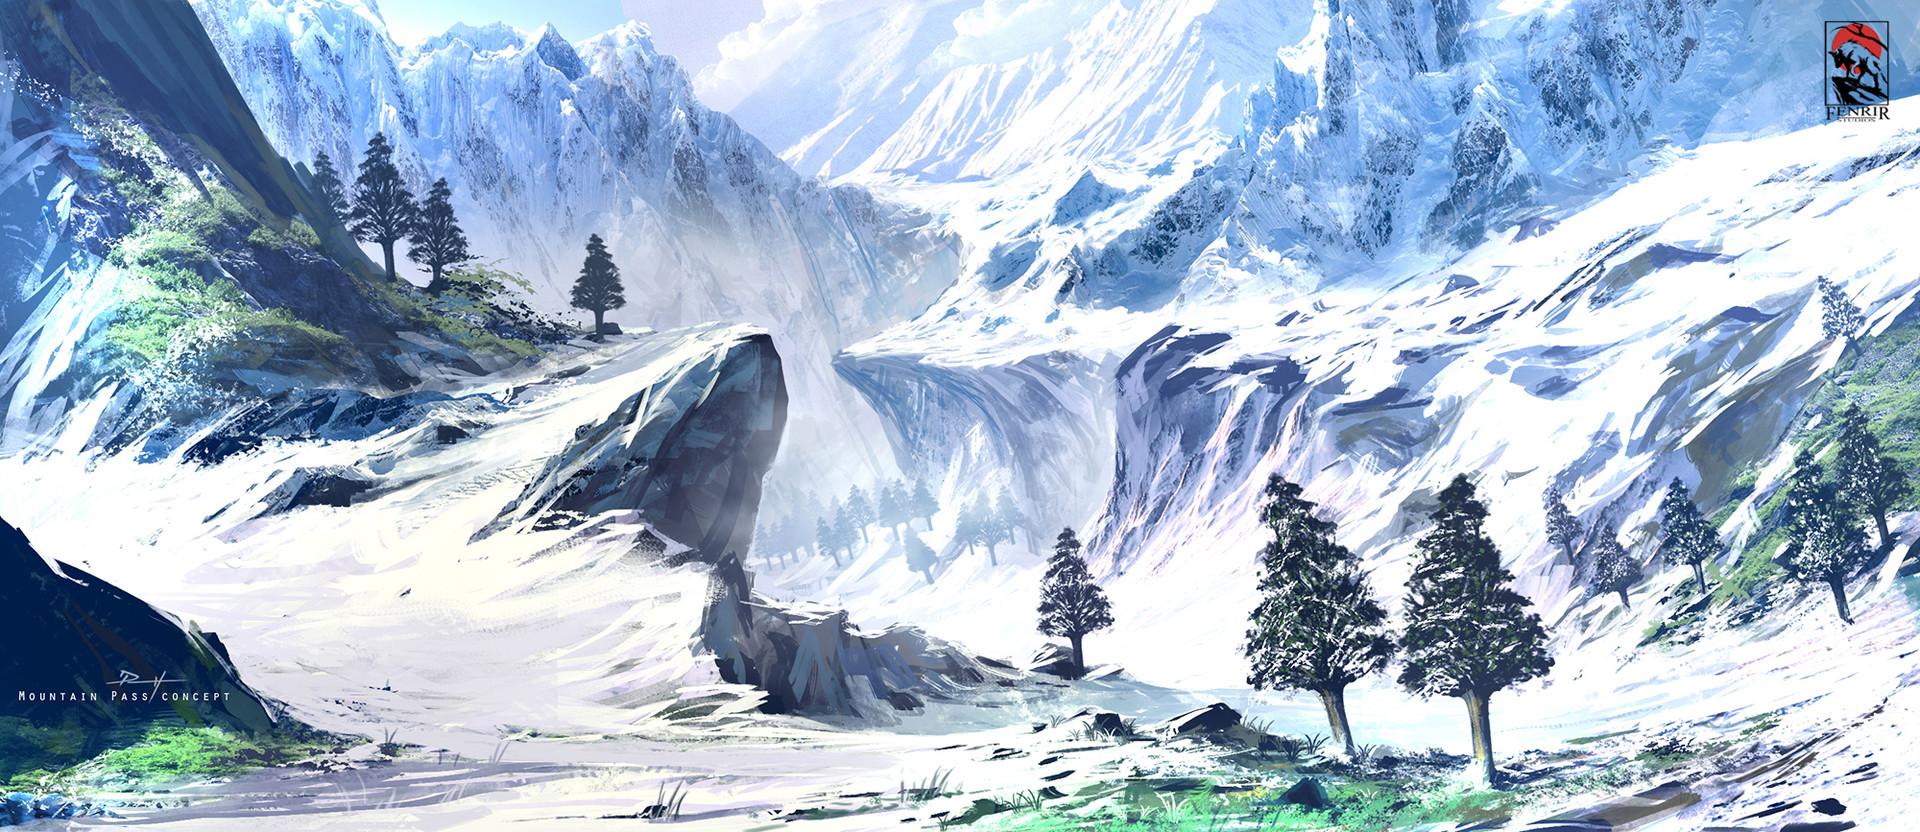 Daniel pellow mountain pass3